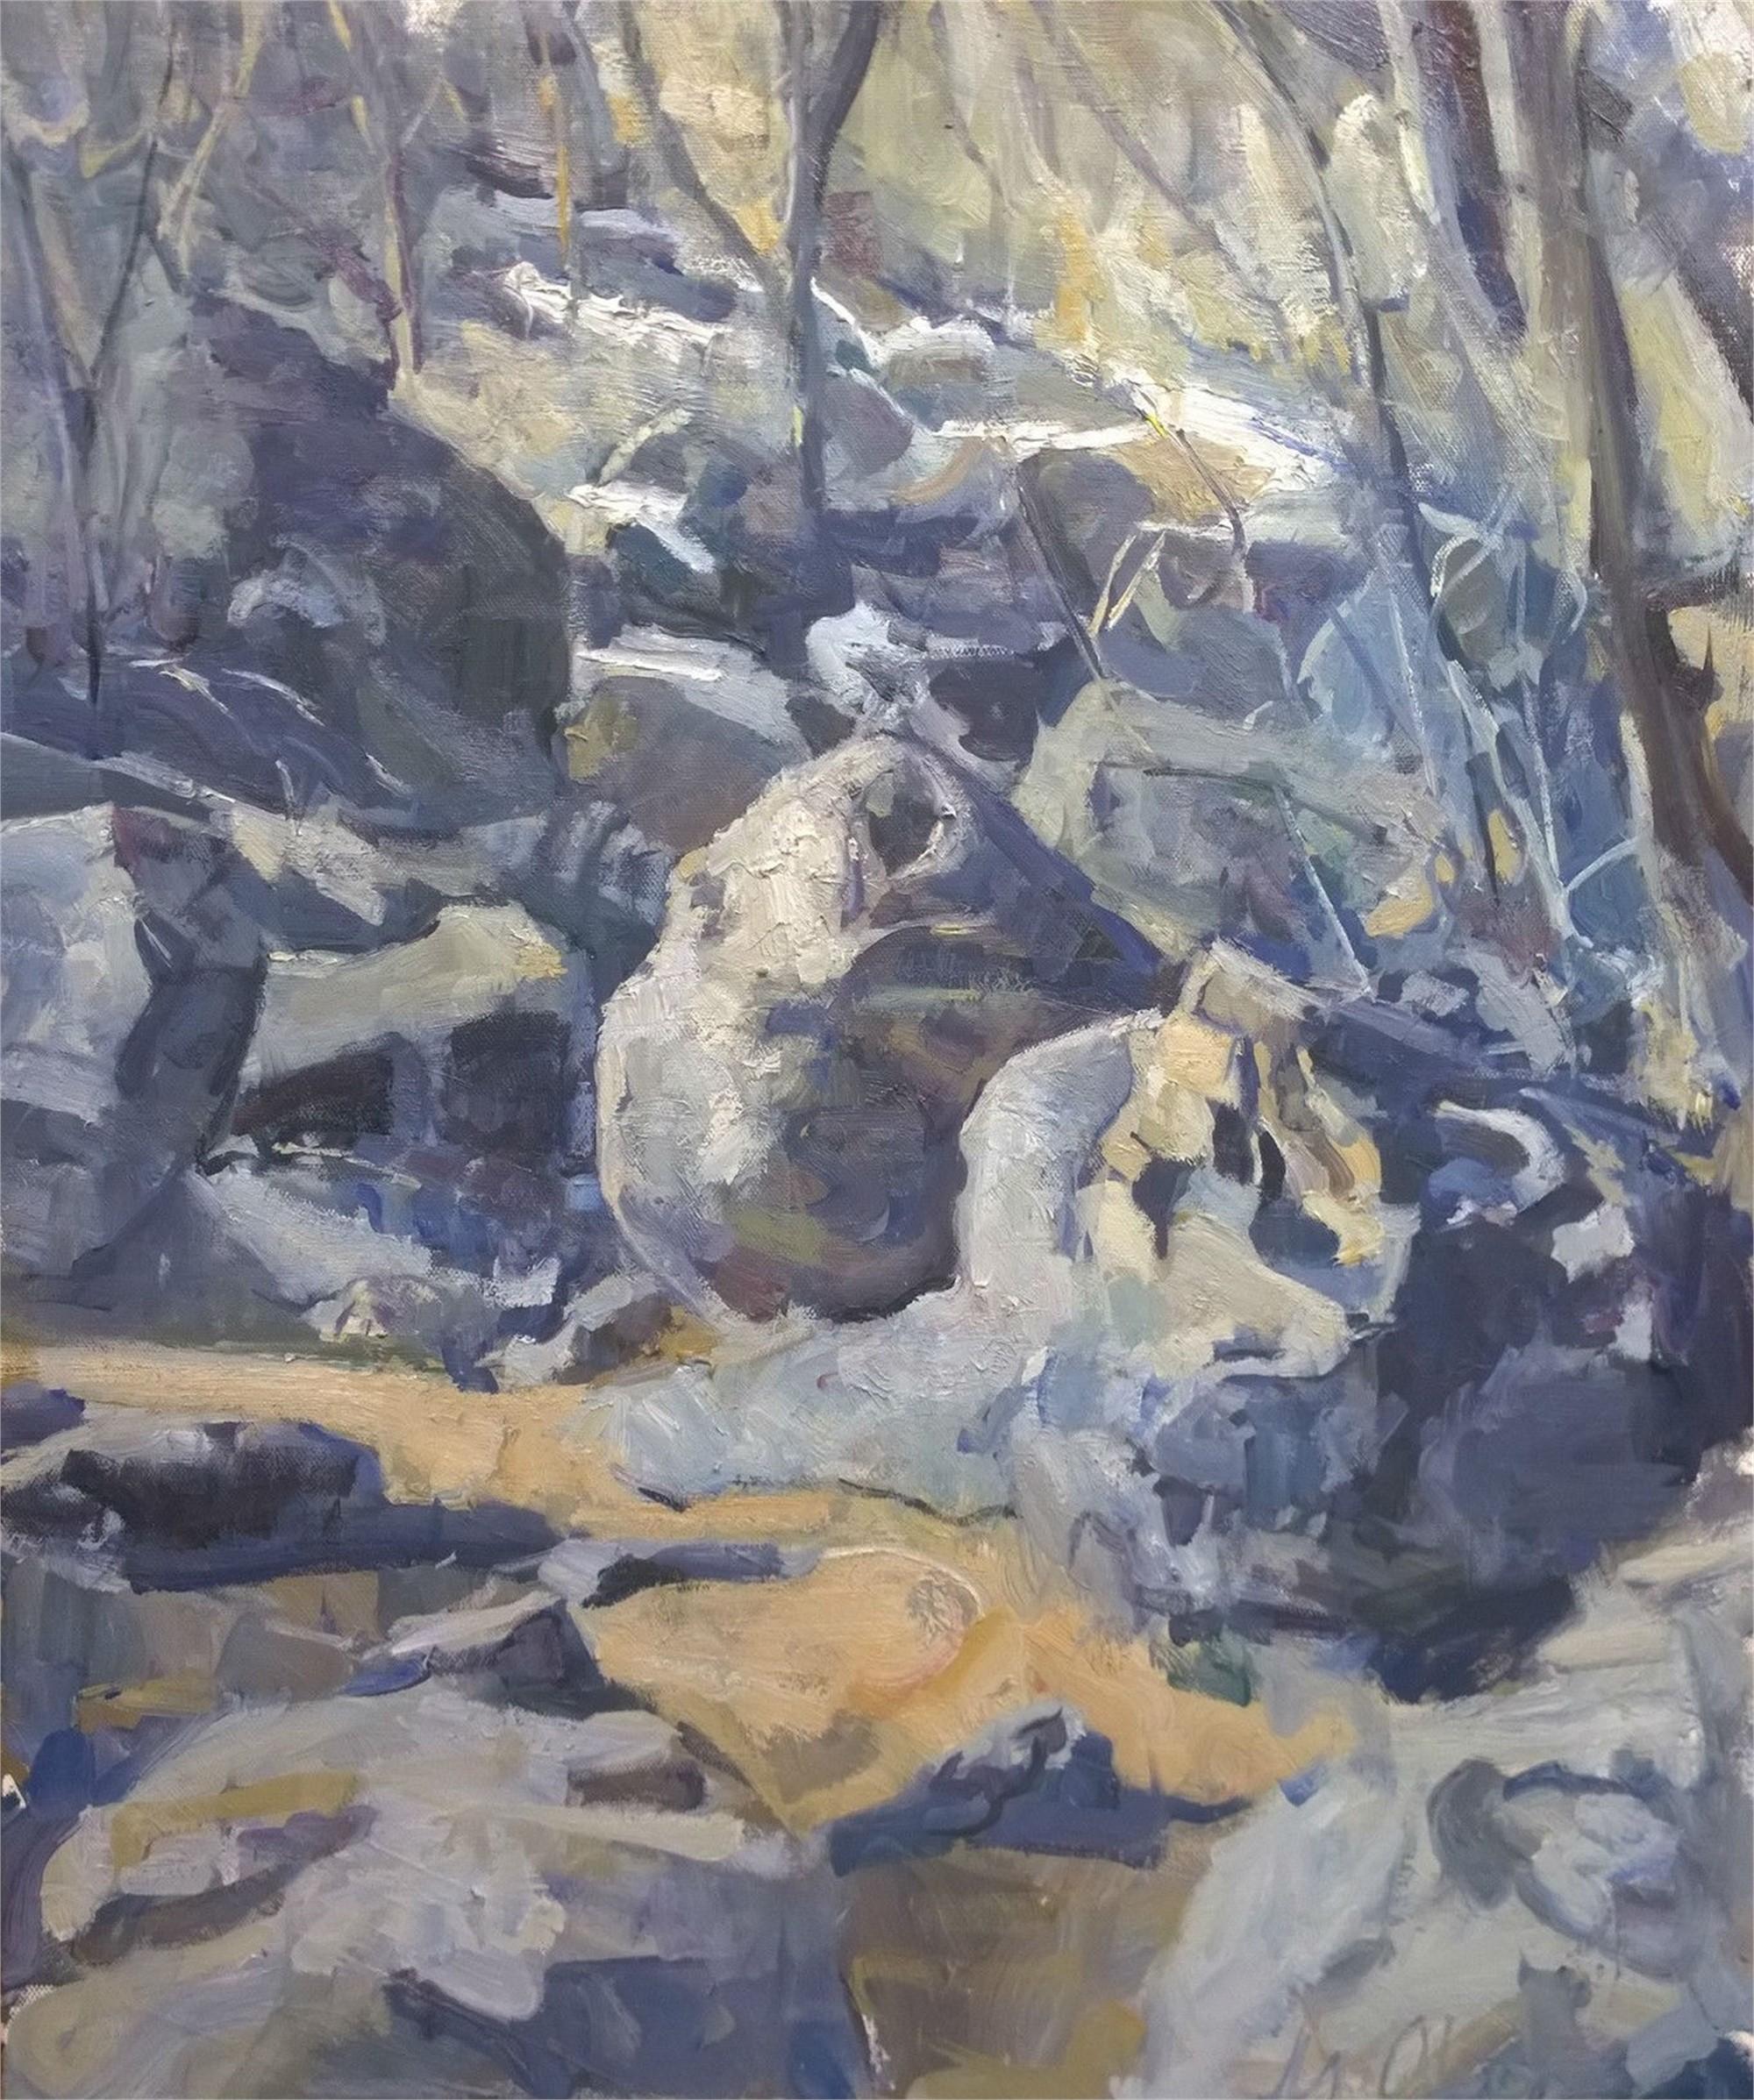 Trailhead by Mikael Olson